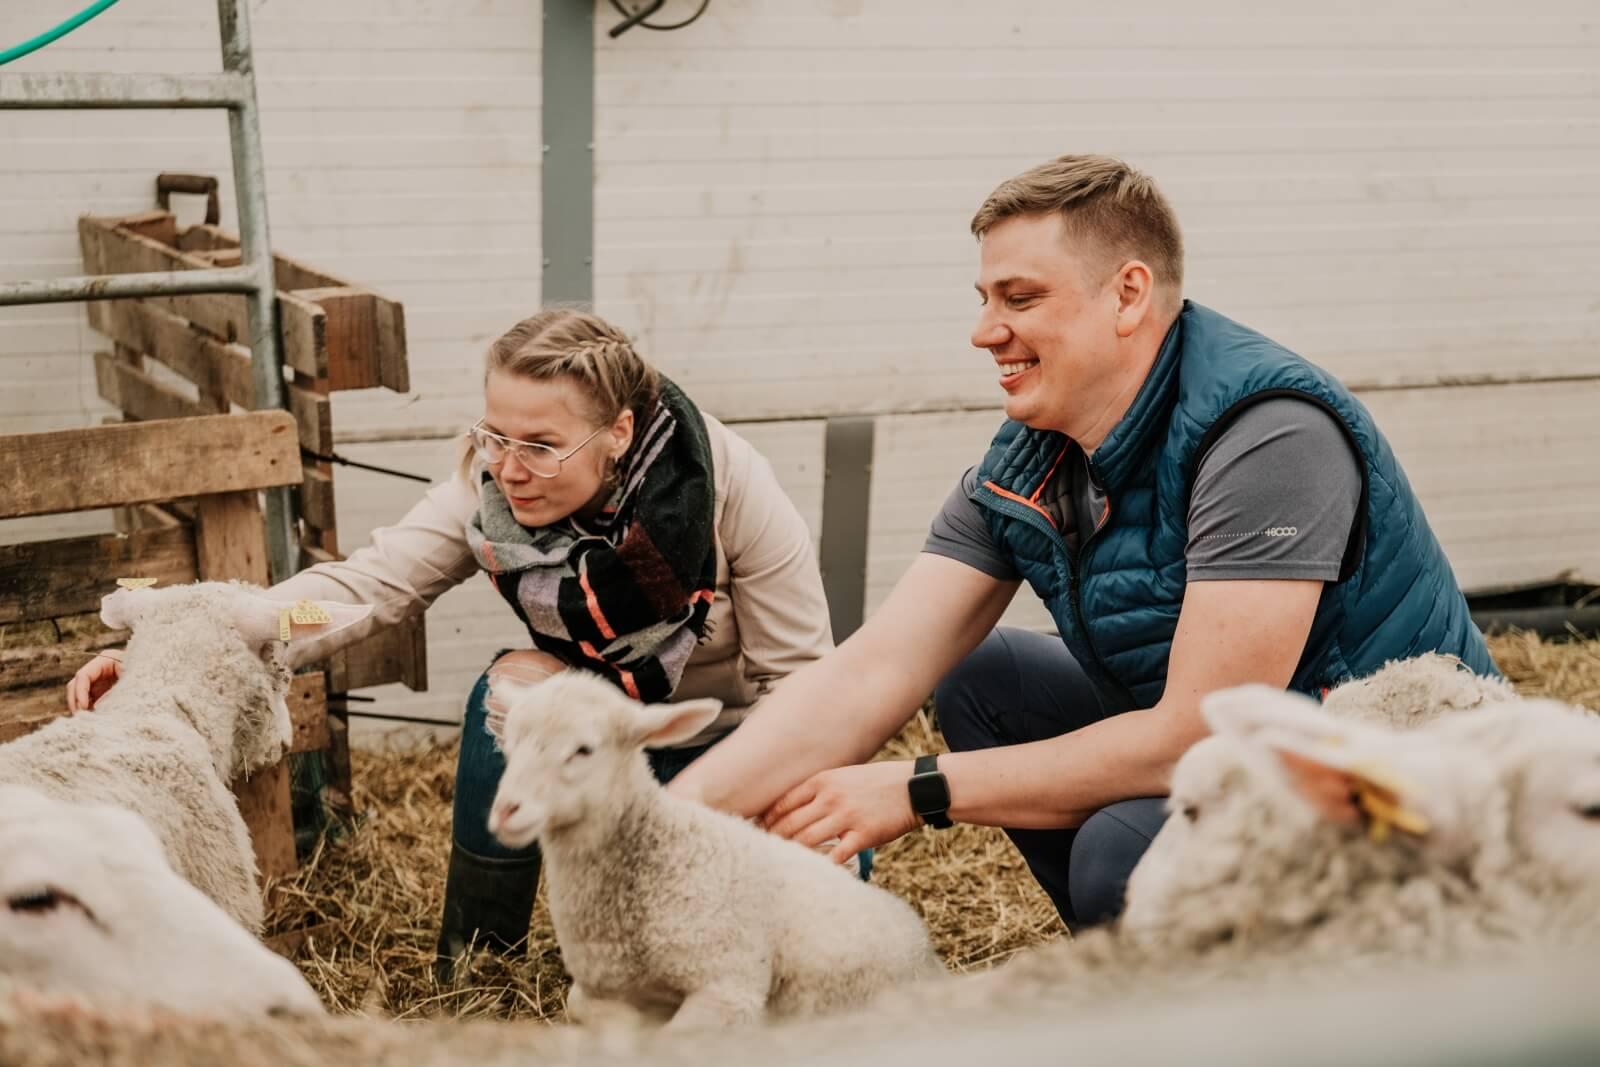 Laulja Alen Veziko tutvustamas lambaid